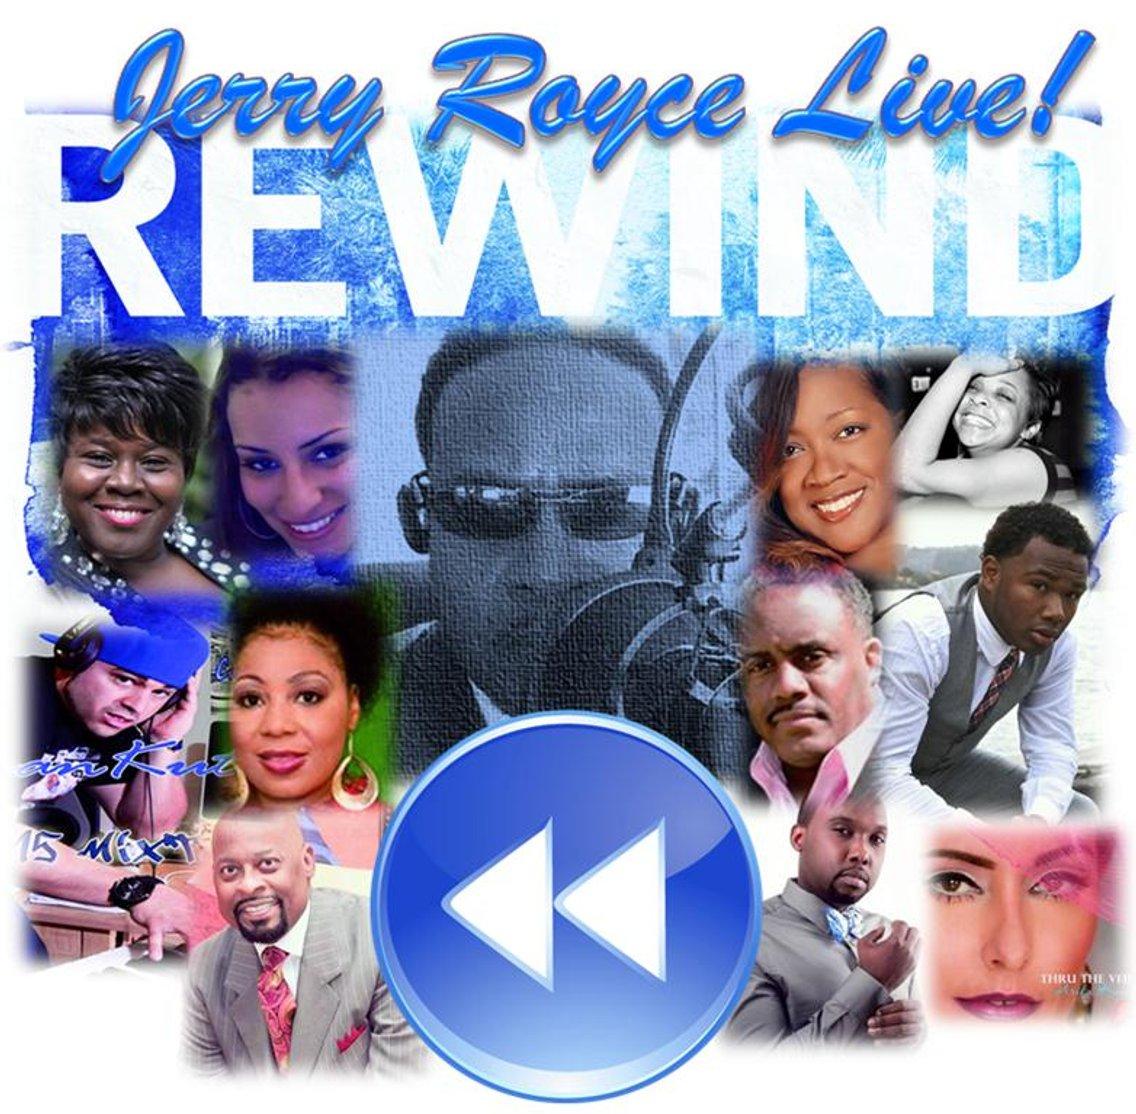 STREAMIN' WIT' JERRY ROYCE LIVE DAY SHOW - immagine di copertina